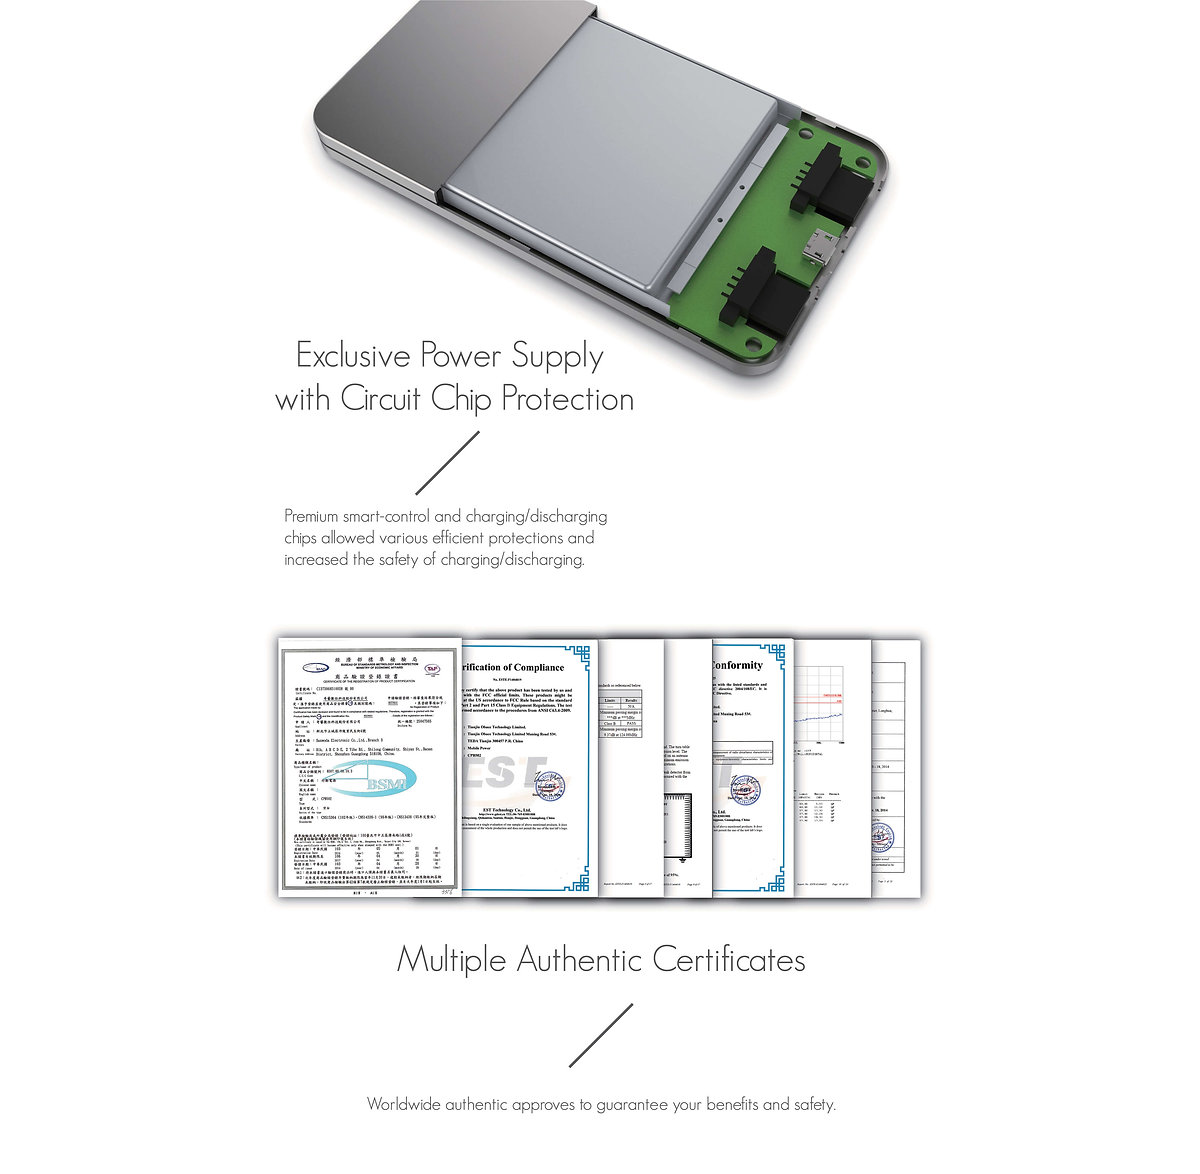 CPB502 wix-08.jpg